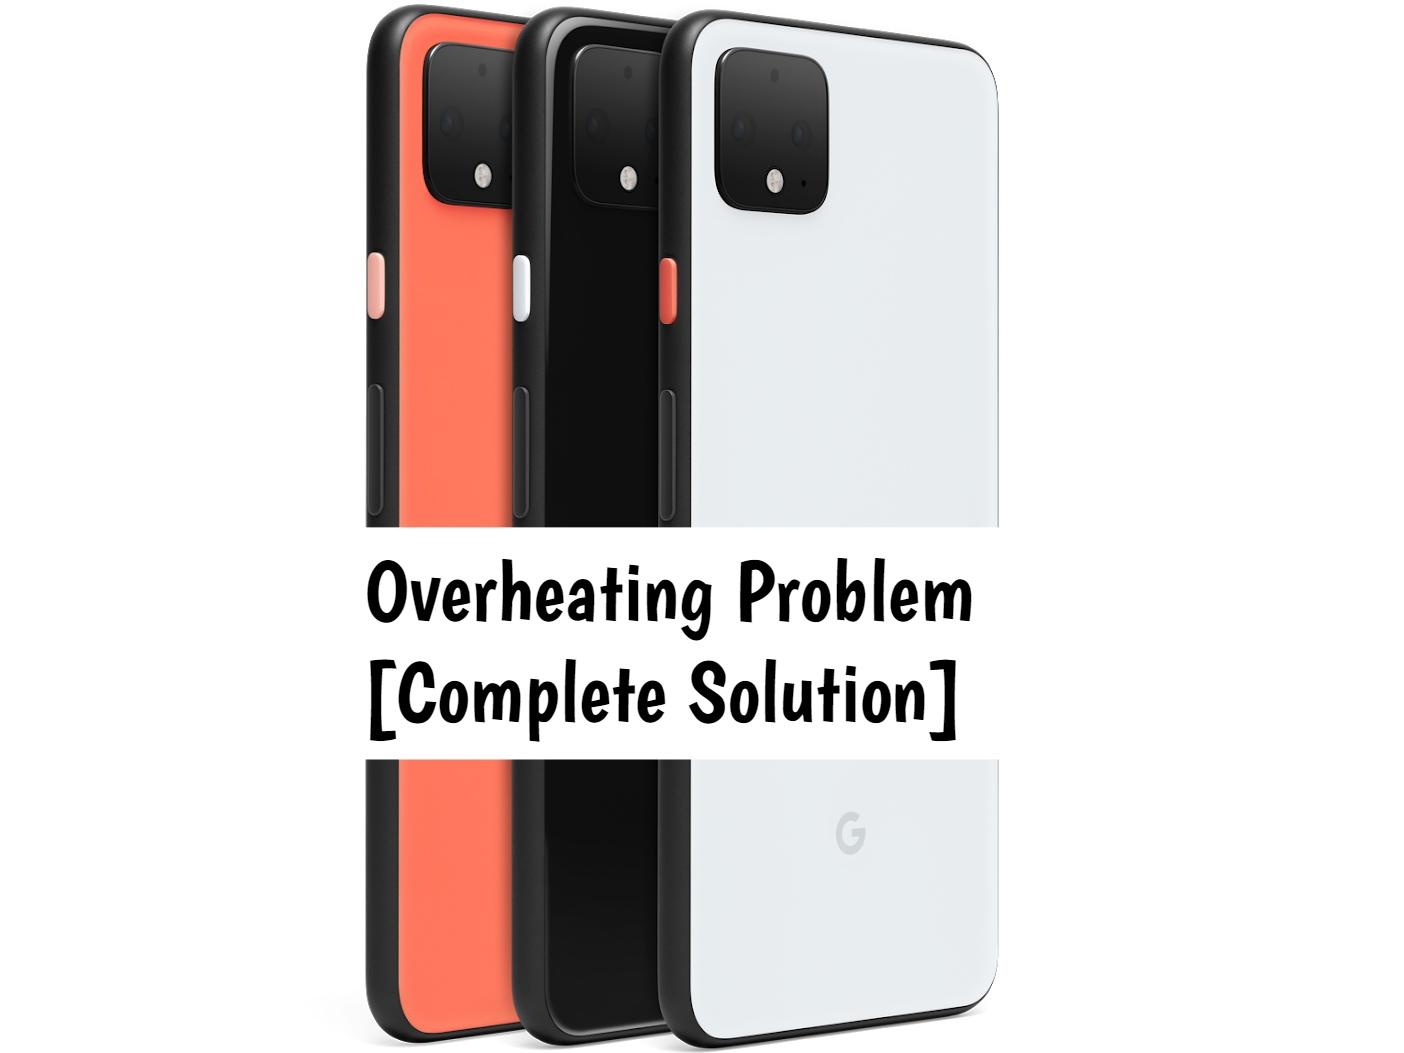 Google Pixel 4 Overheating Problem Fix